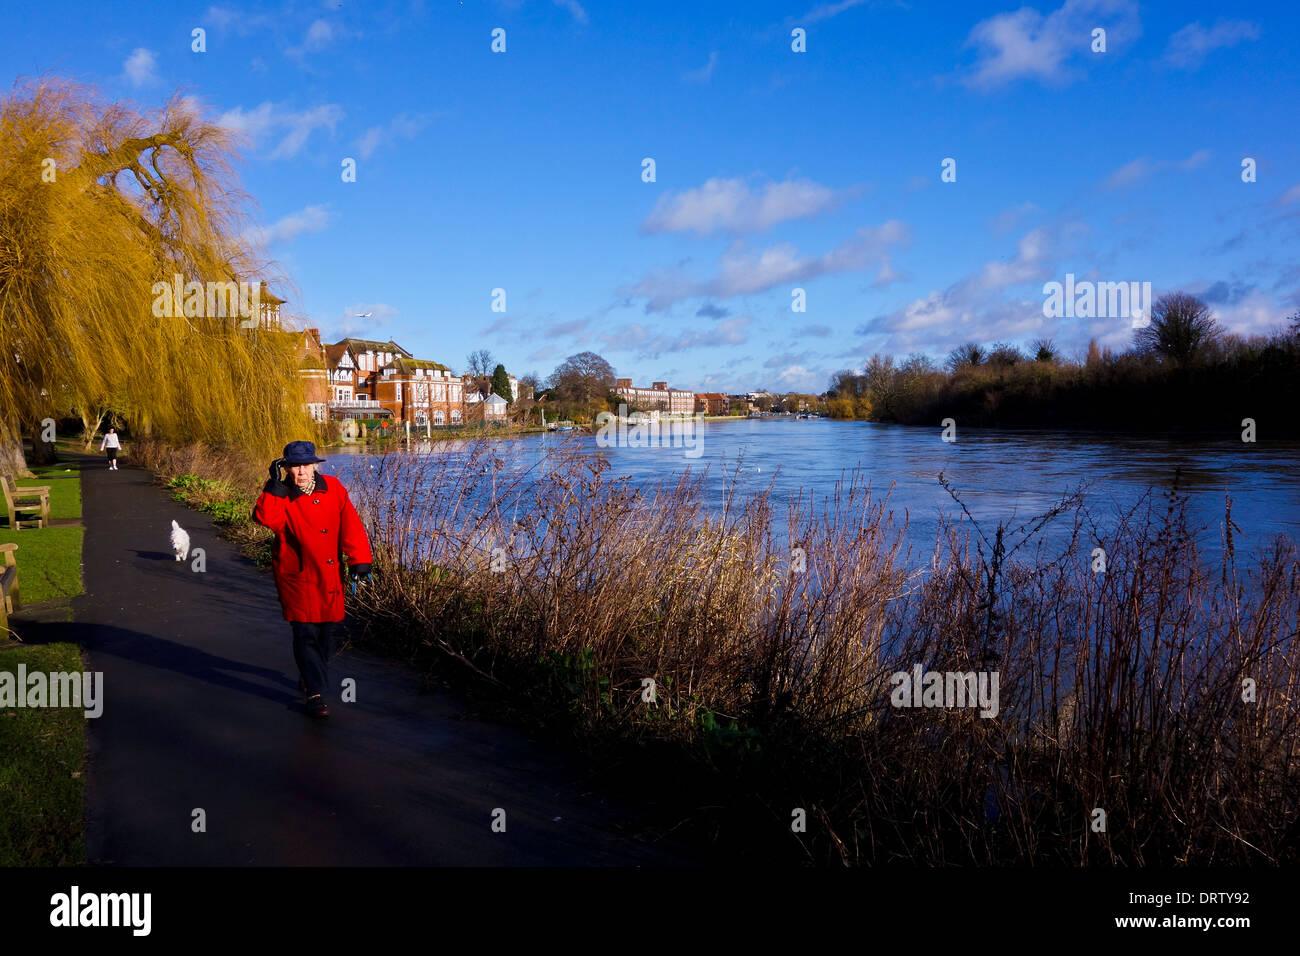 Thames path Radnor Gardens Strawberry Hill Twickenham England UK - Stock Image